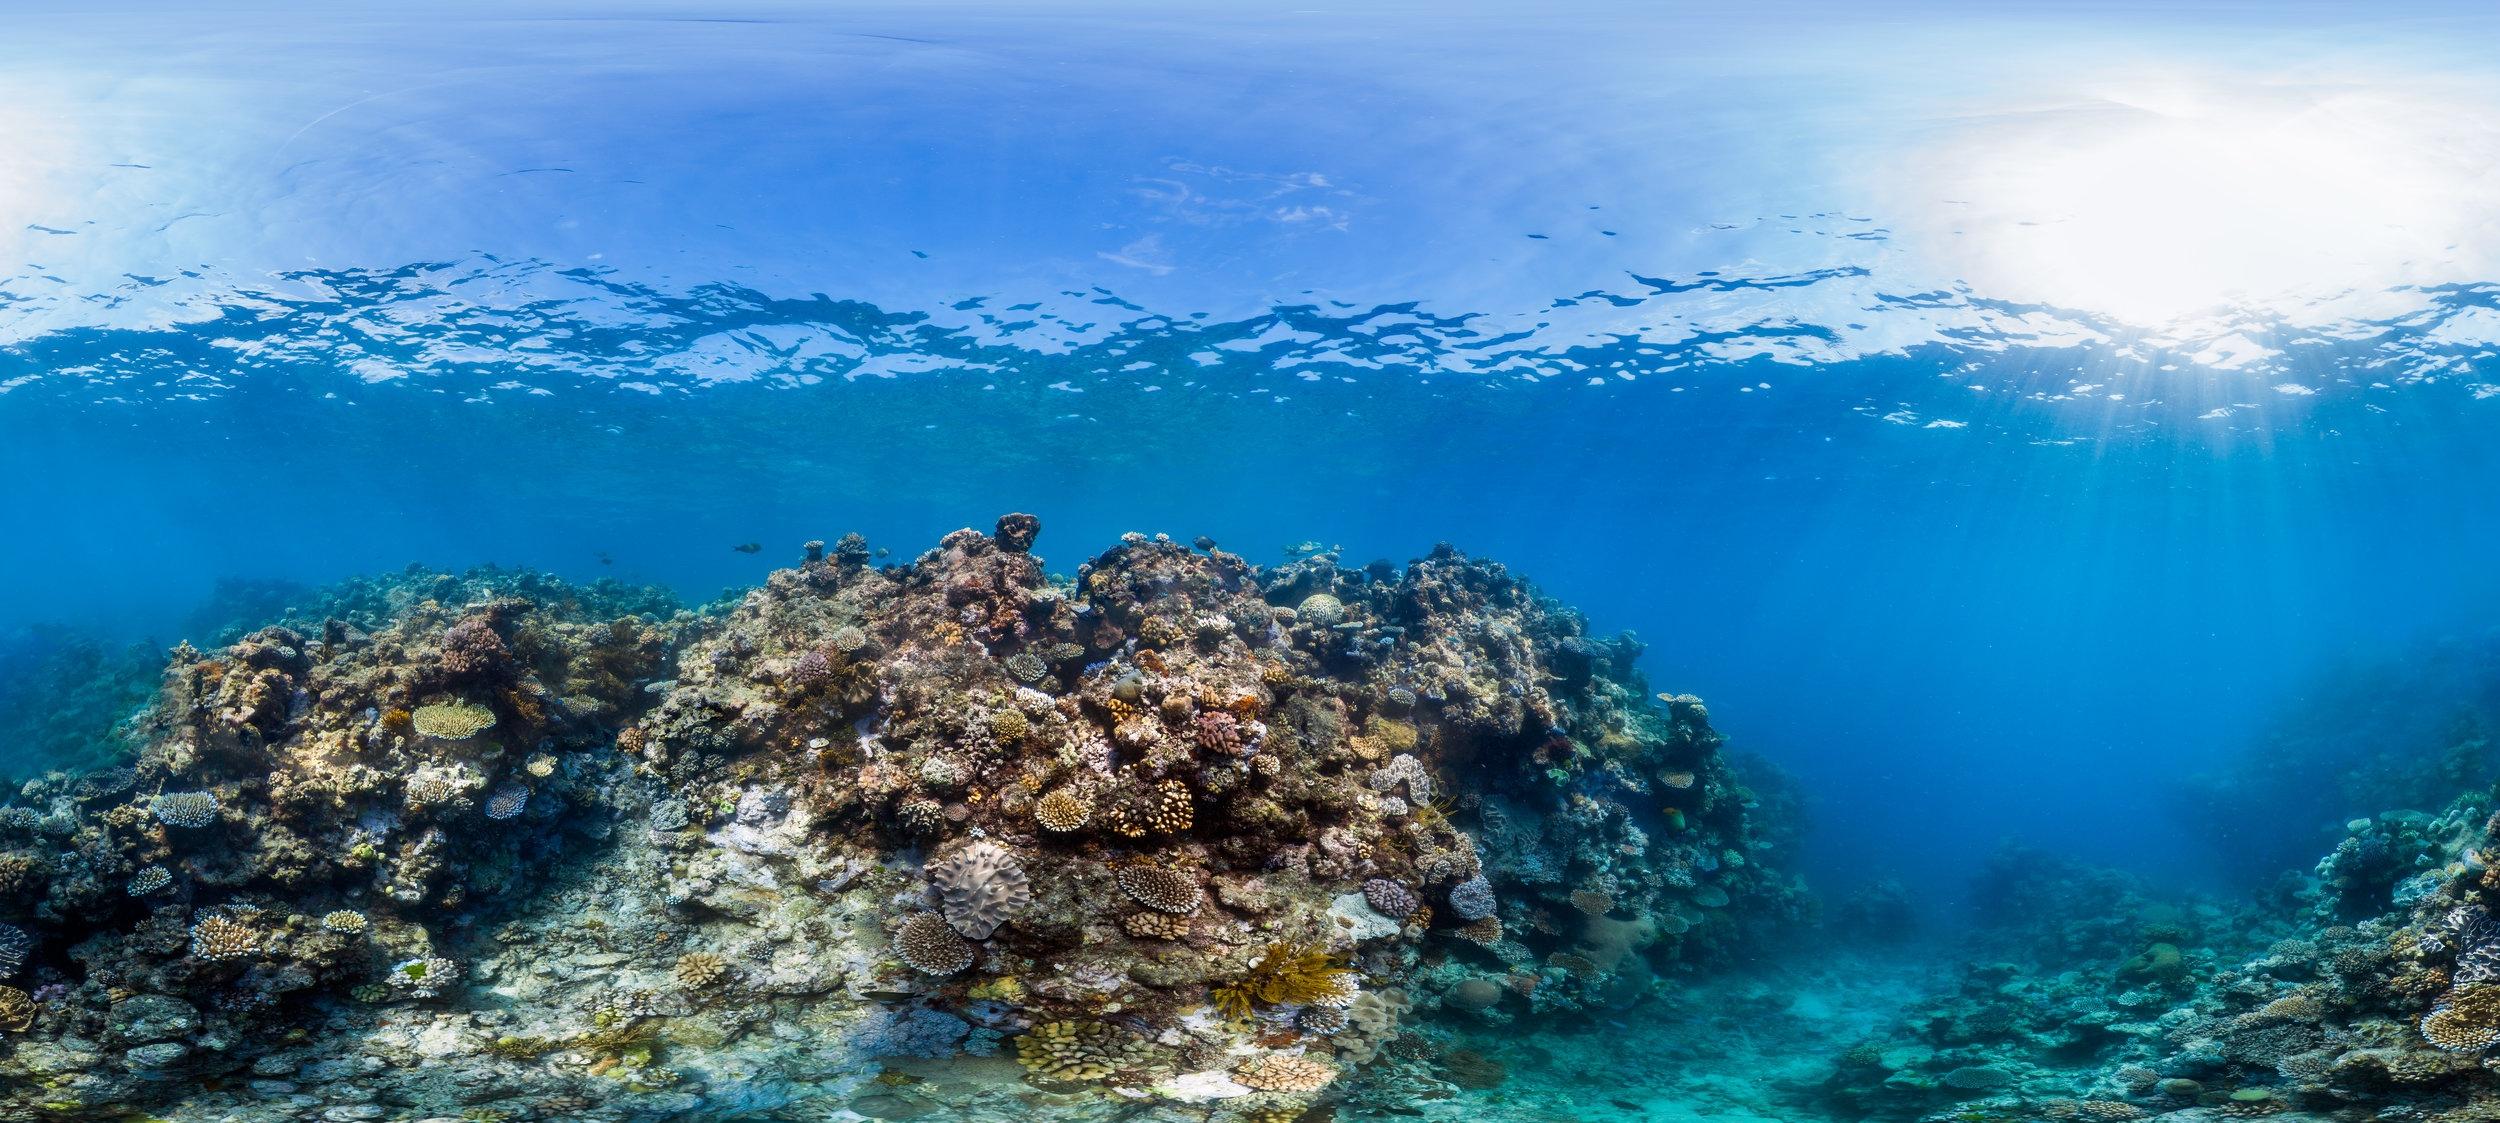 norman REEF CREDIT: THE OCEAN AGENCY / XL CATLIN SEAVIEW SURVEY